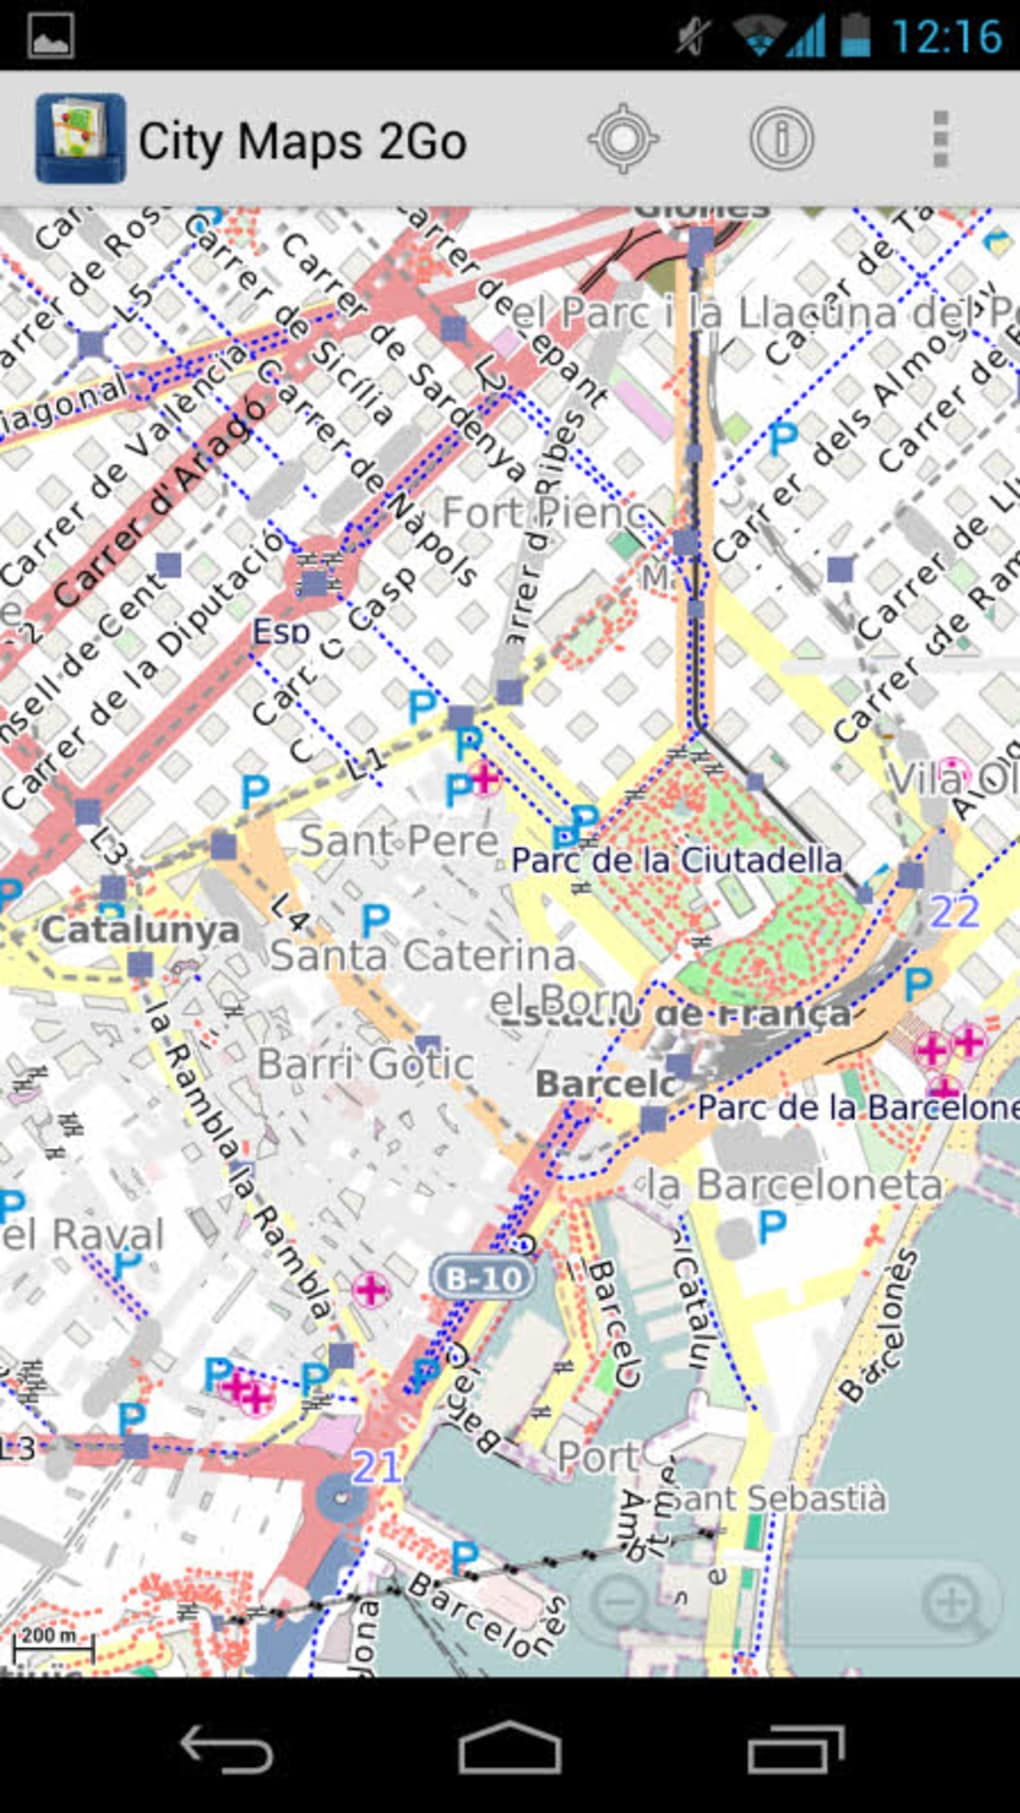 City Map 2 Go